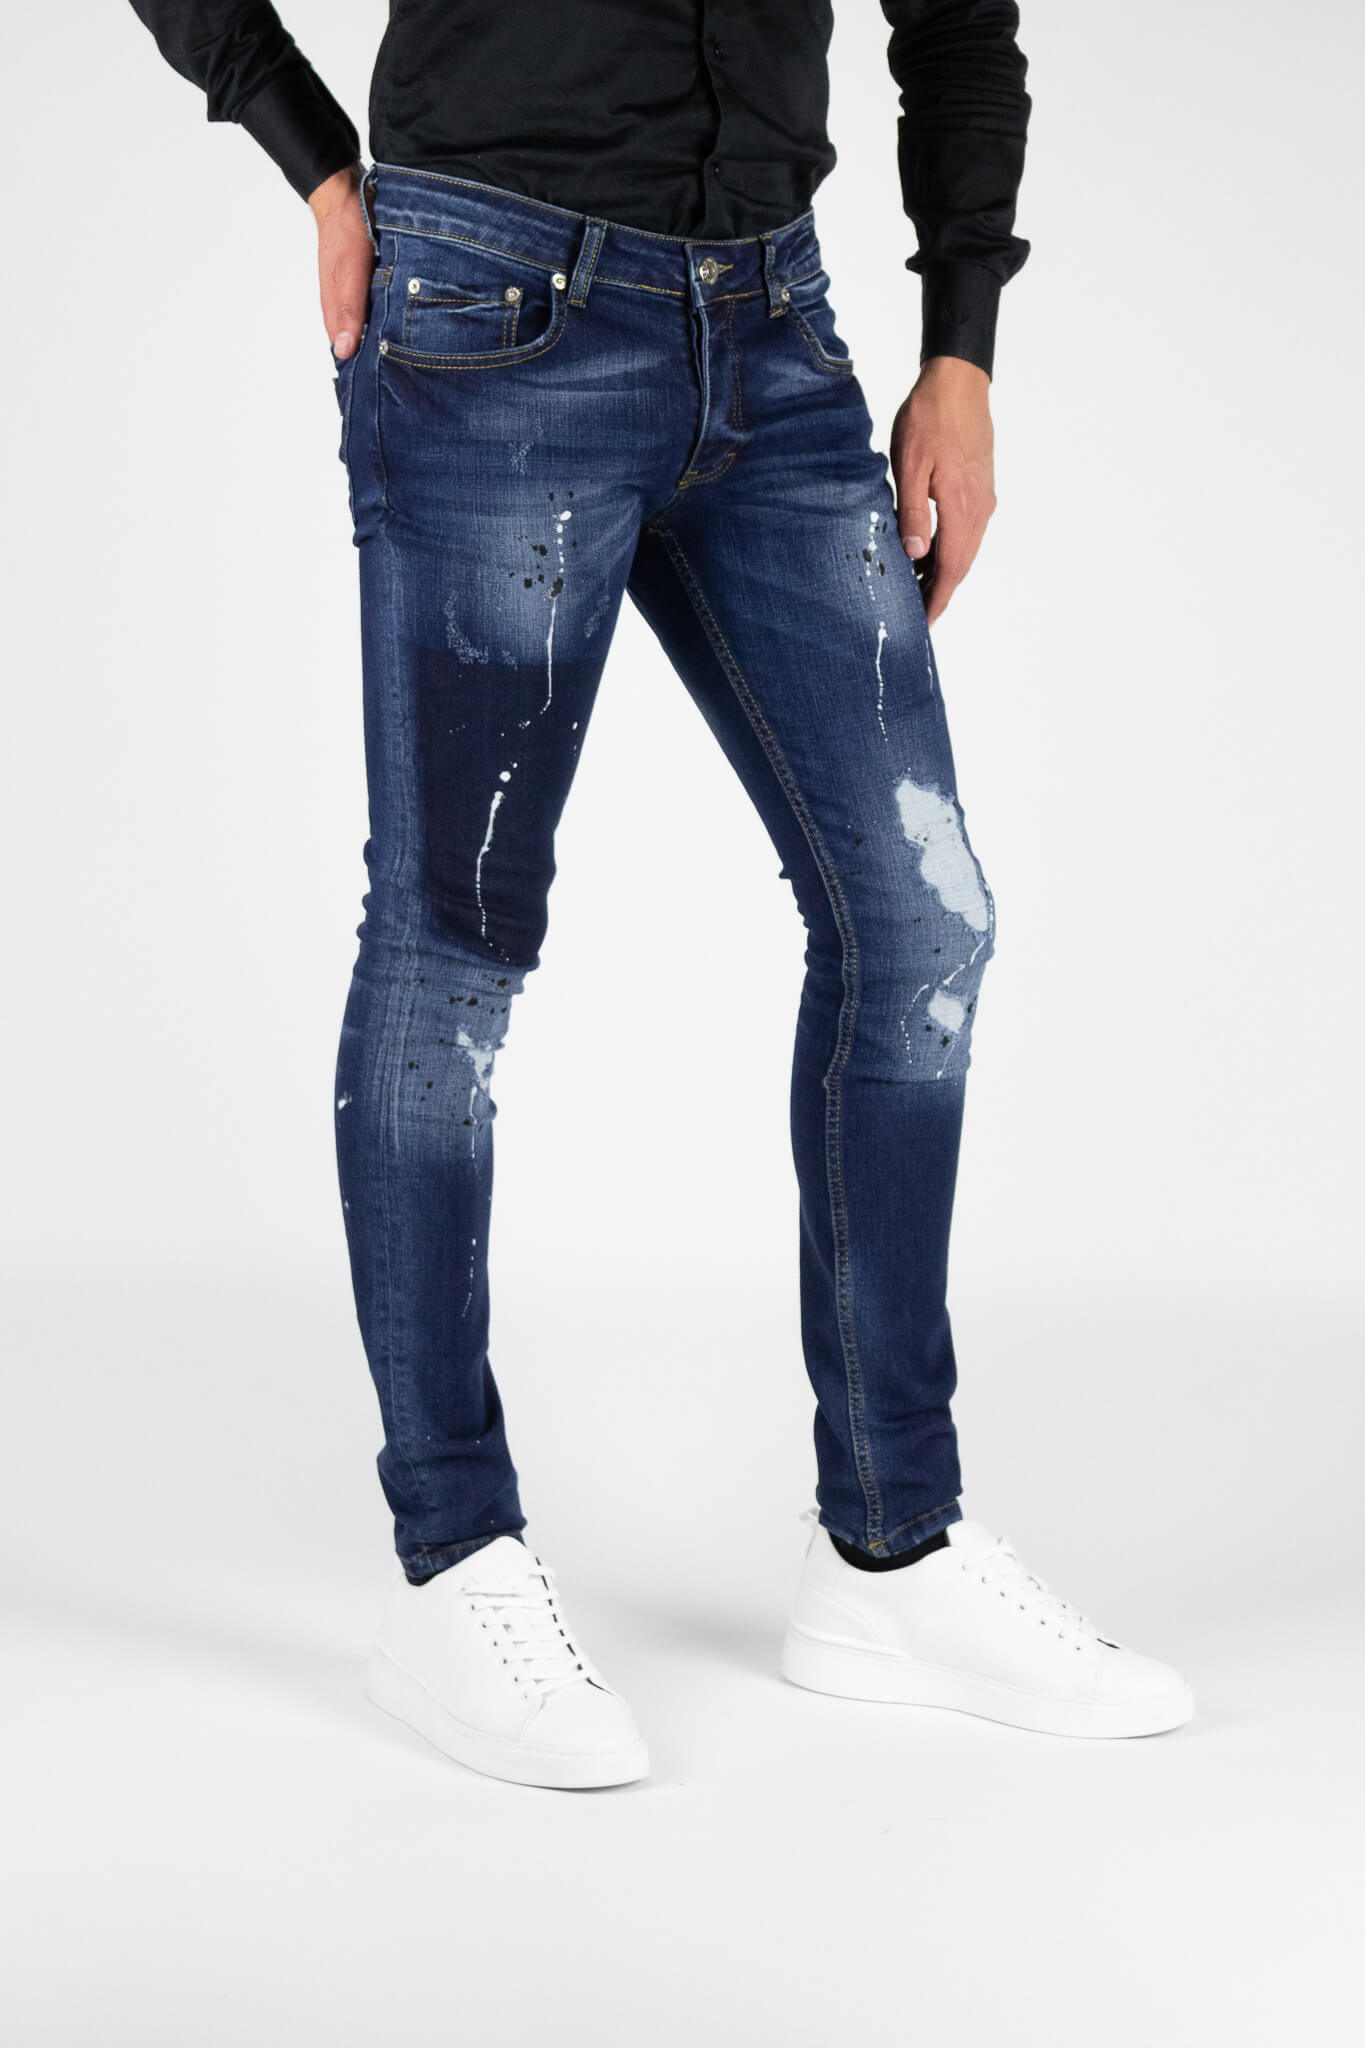 Toulon-Blue-Jeans-5.jpg